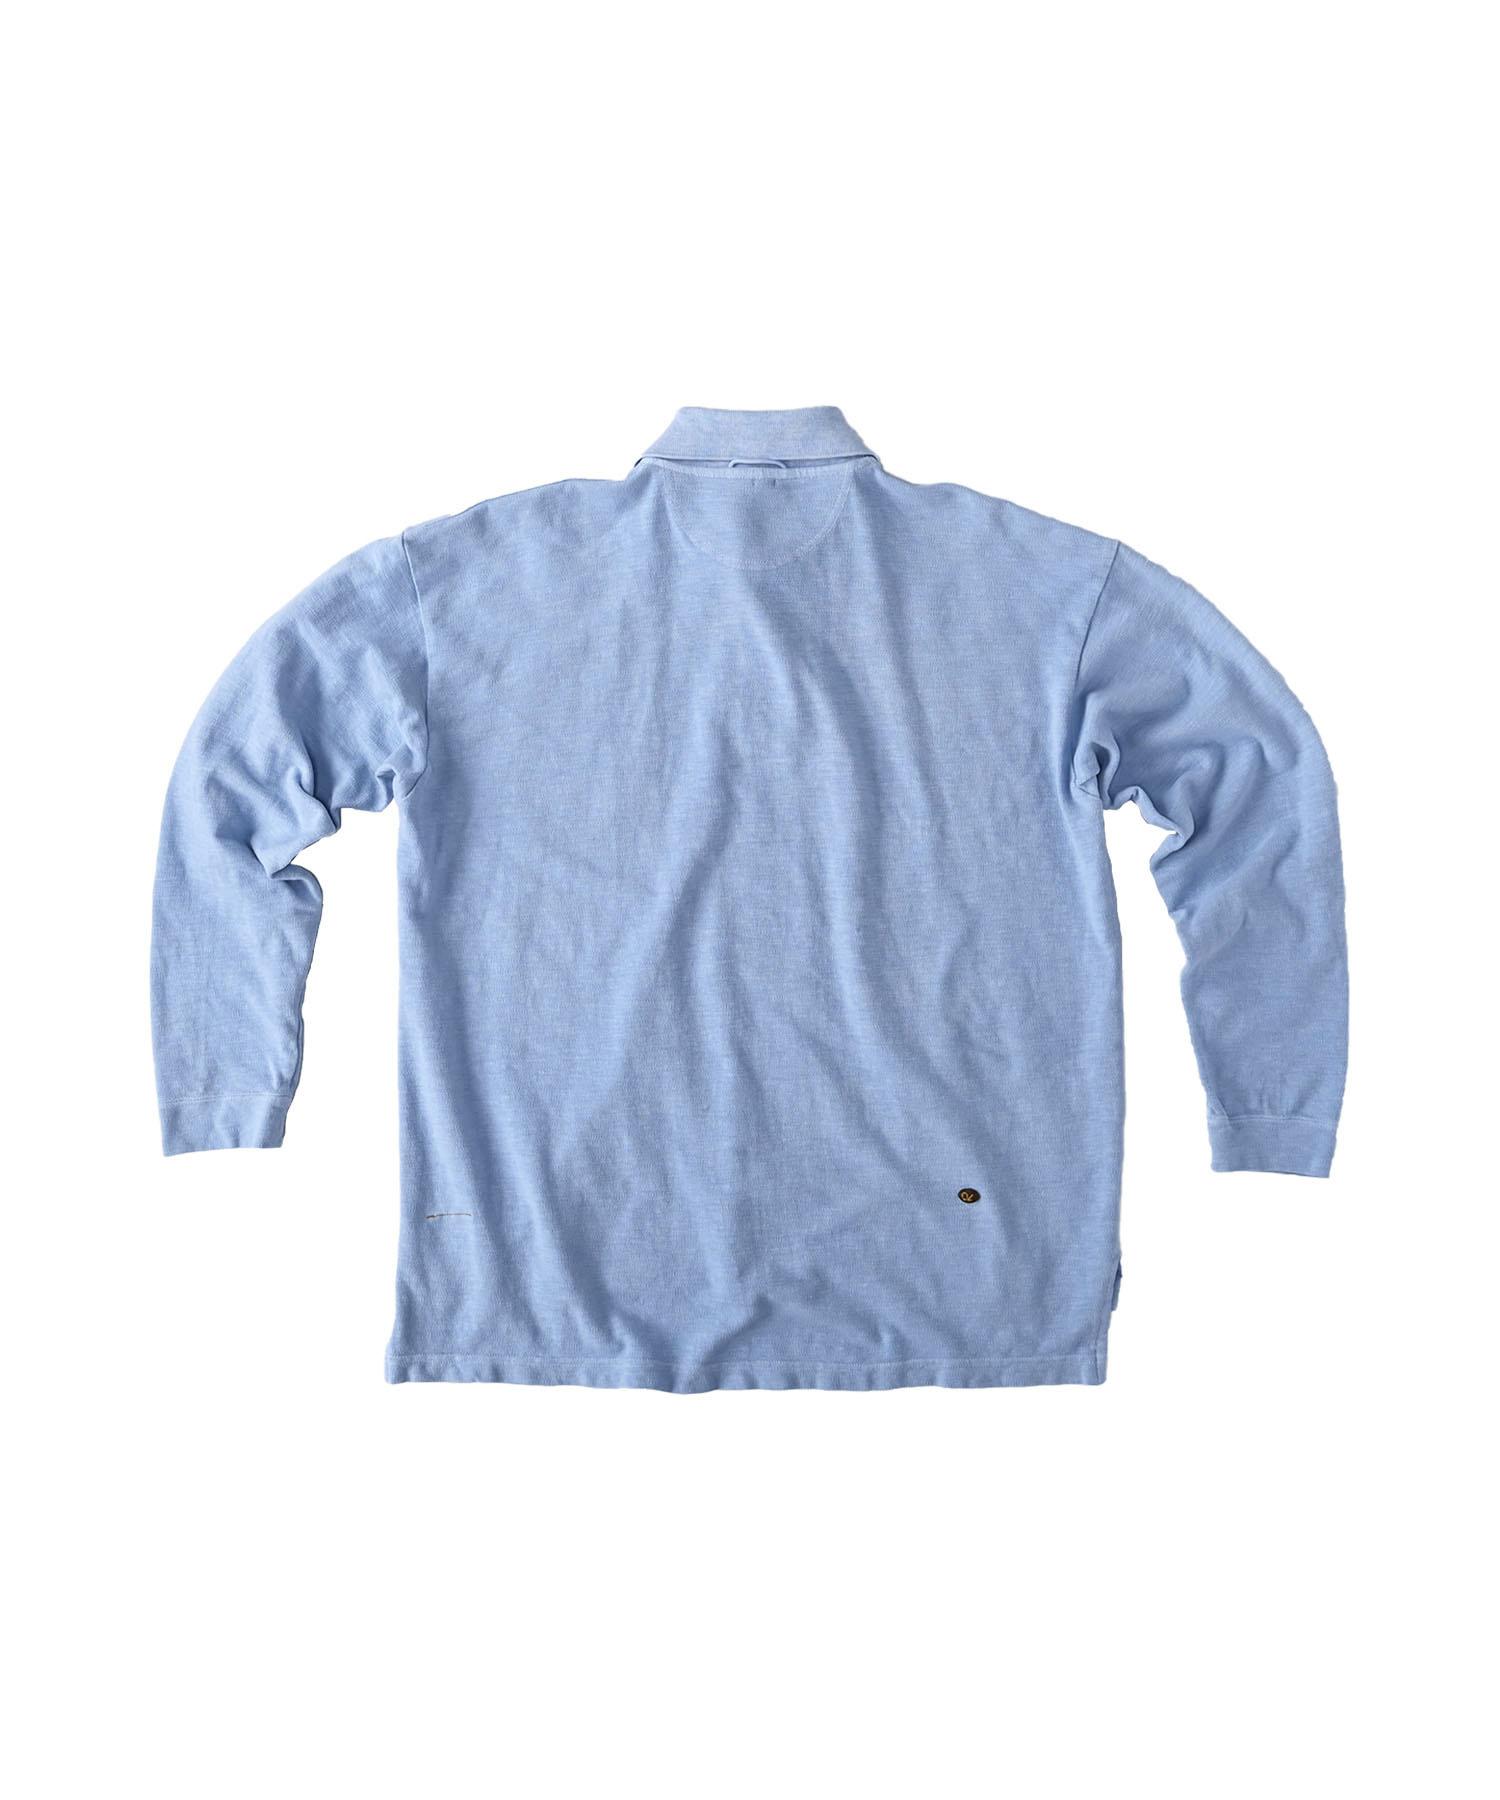 Kanoko Ocean Shiokaze Long-sleeved Polo Shirt (0421)-7